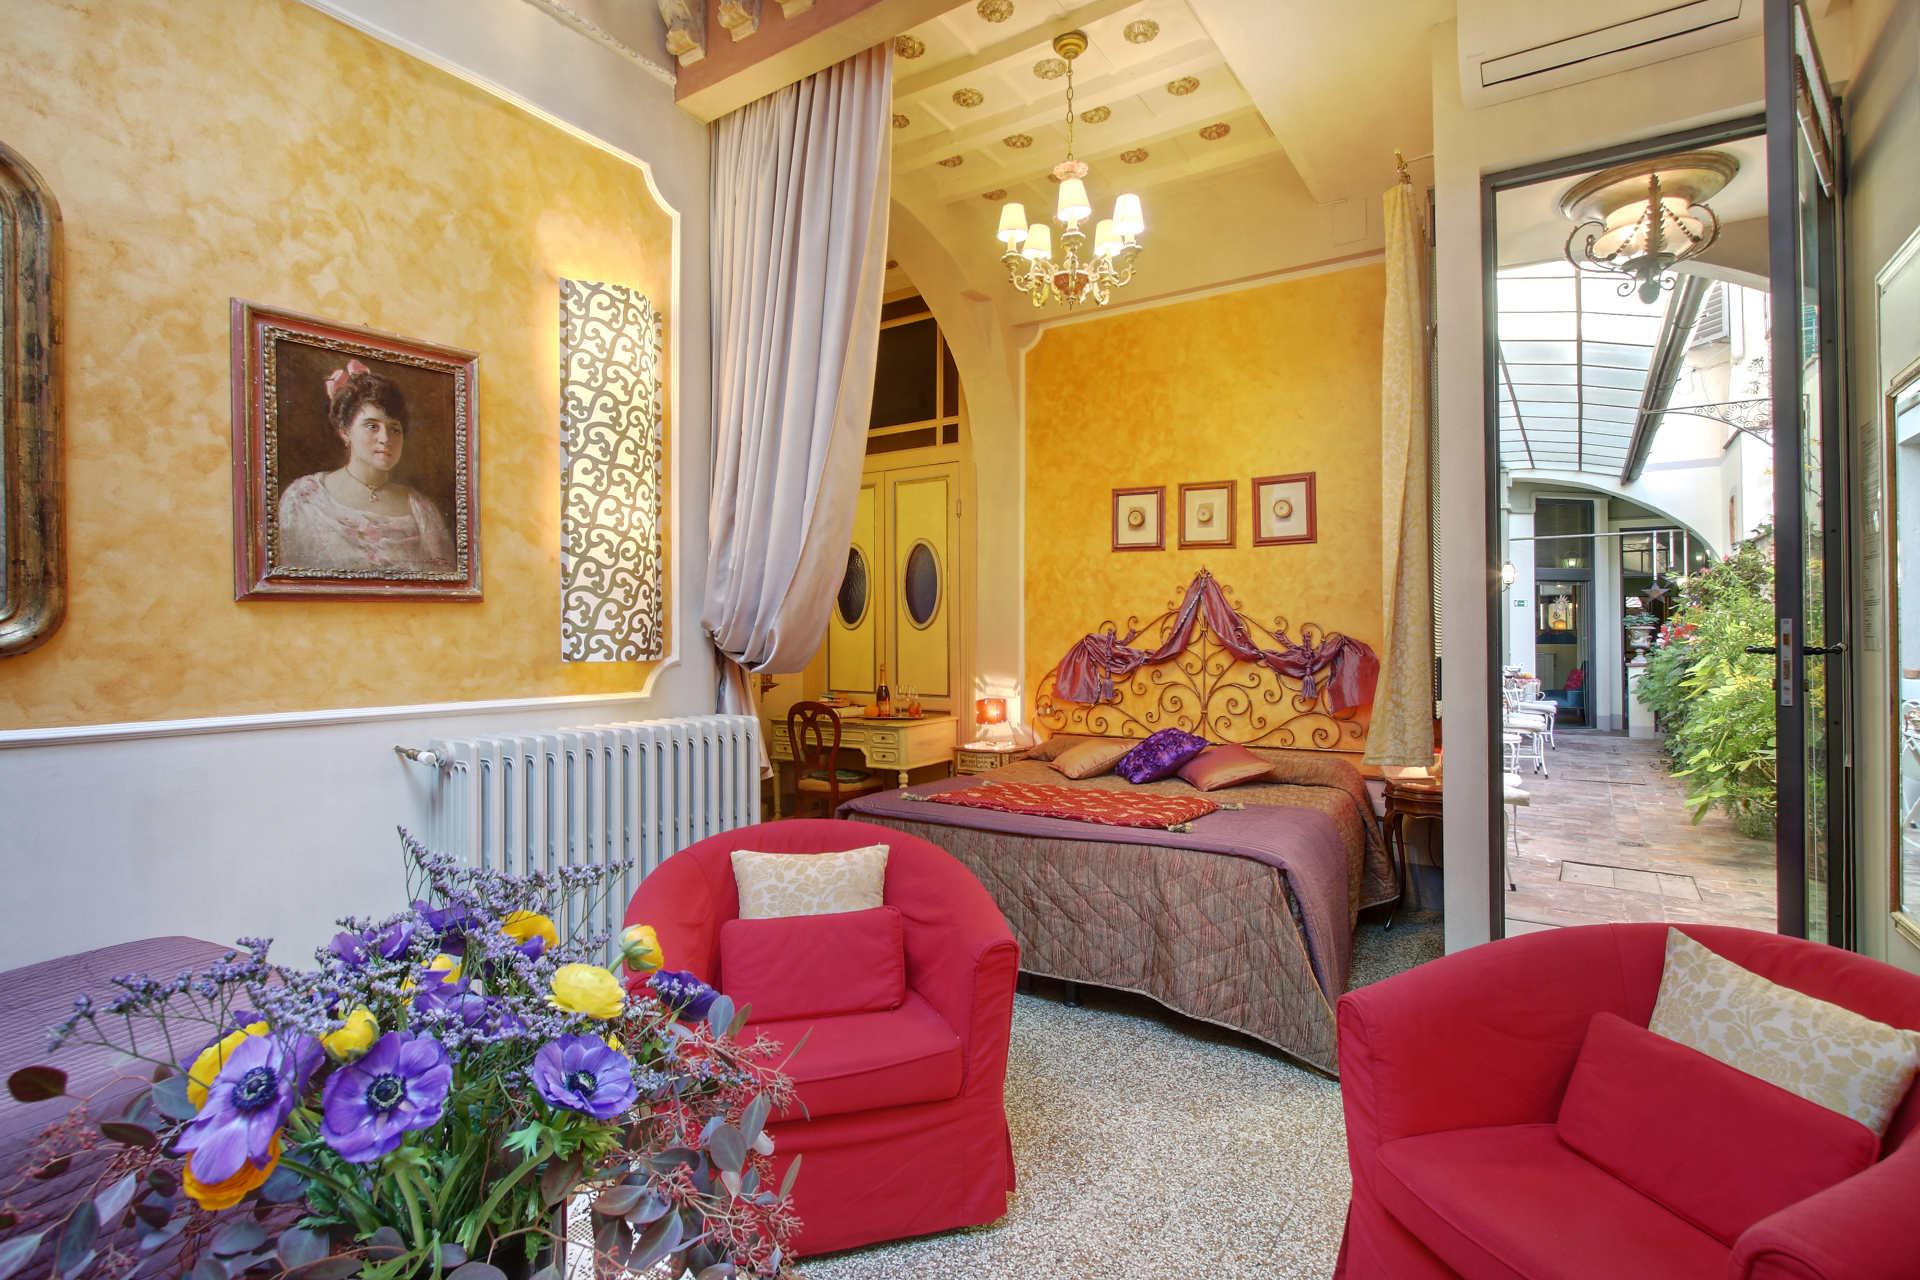 Relais grand tour e grand tour suites firenze fi official reservation system - Hotel diva firenze ...